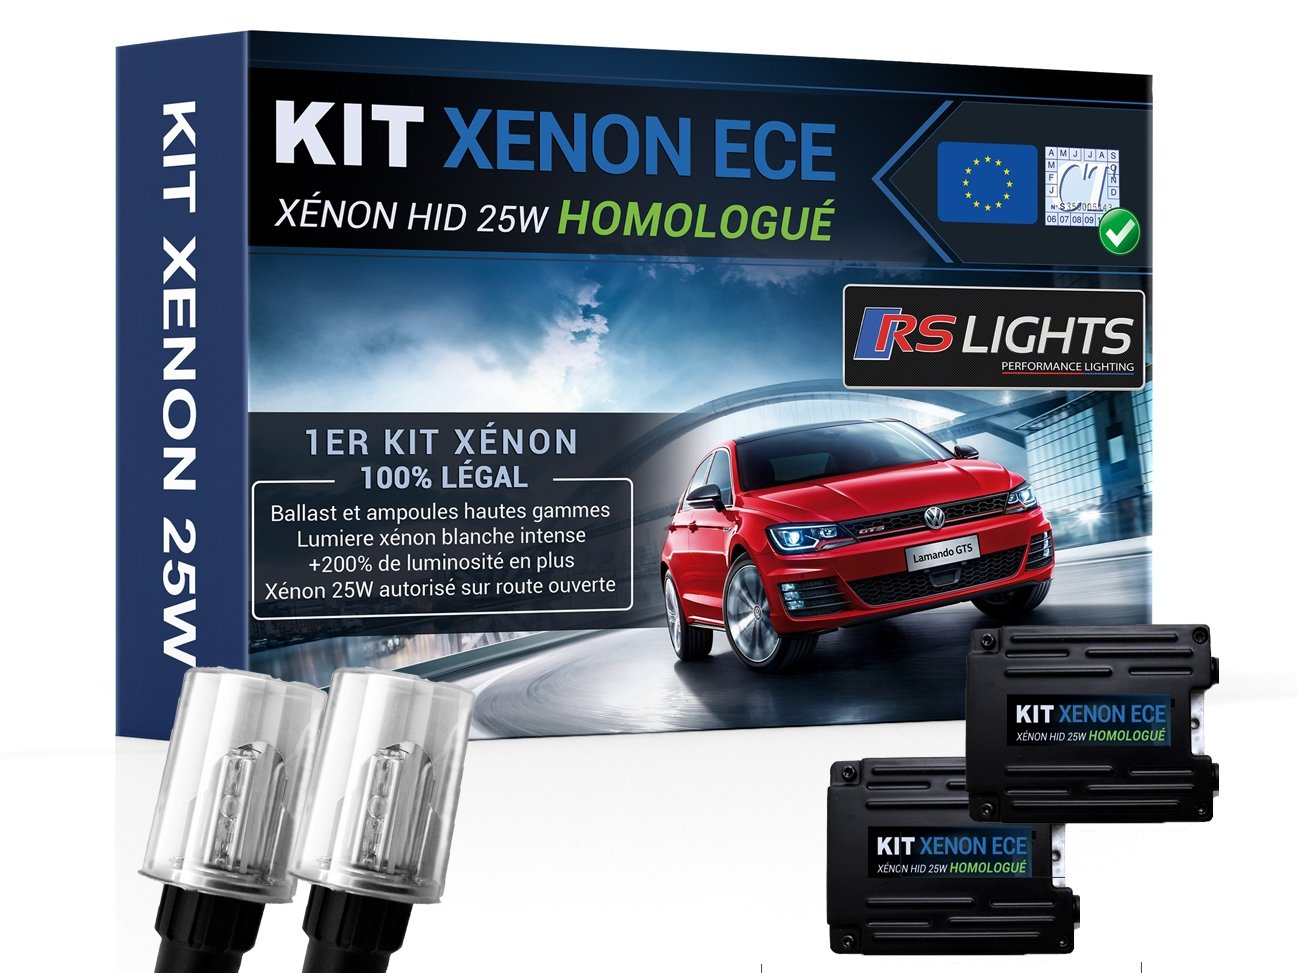 Kit xenón h7 25 W coche Auto - Homologado - Anti error ODB - blanco 6000 K: Amazon.es: Coche y moto